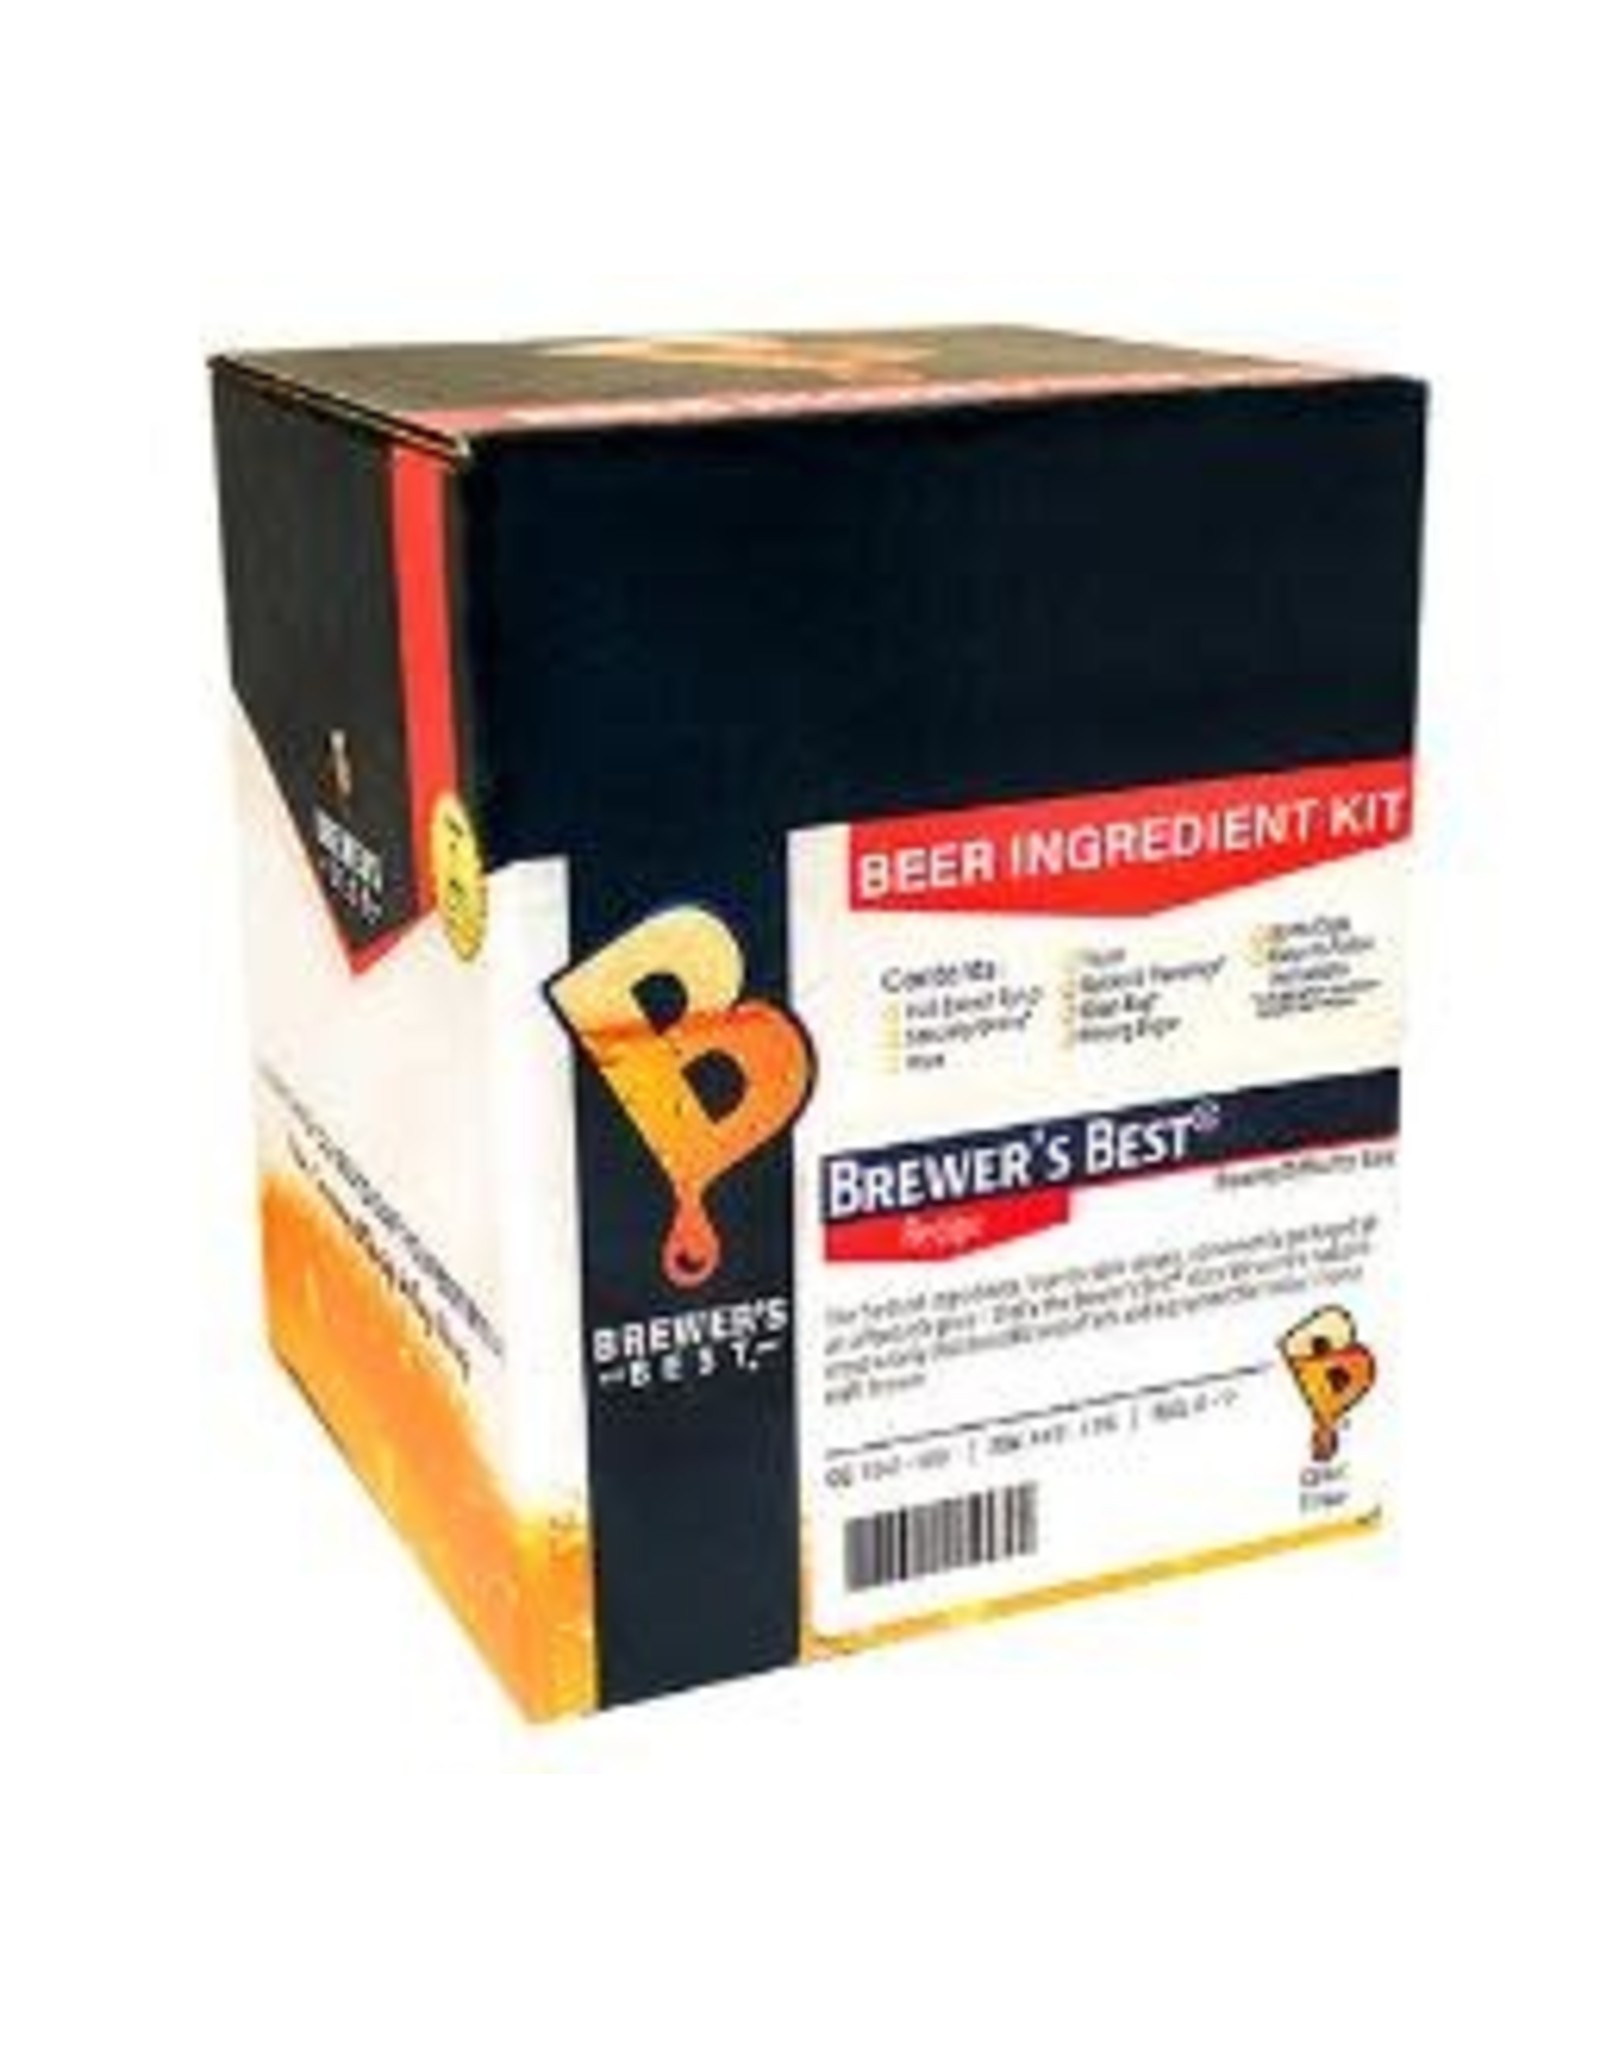 BREWERS BEST 1408 BREWERS BEST PORTER KIT